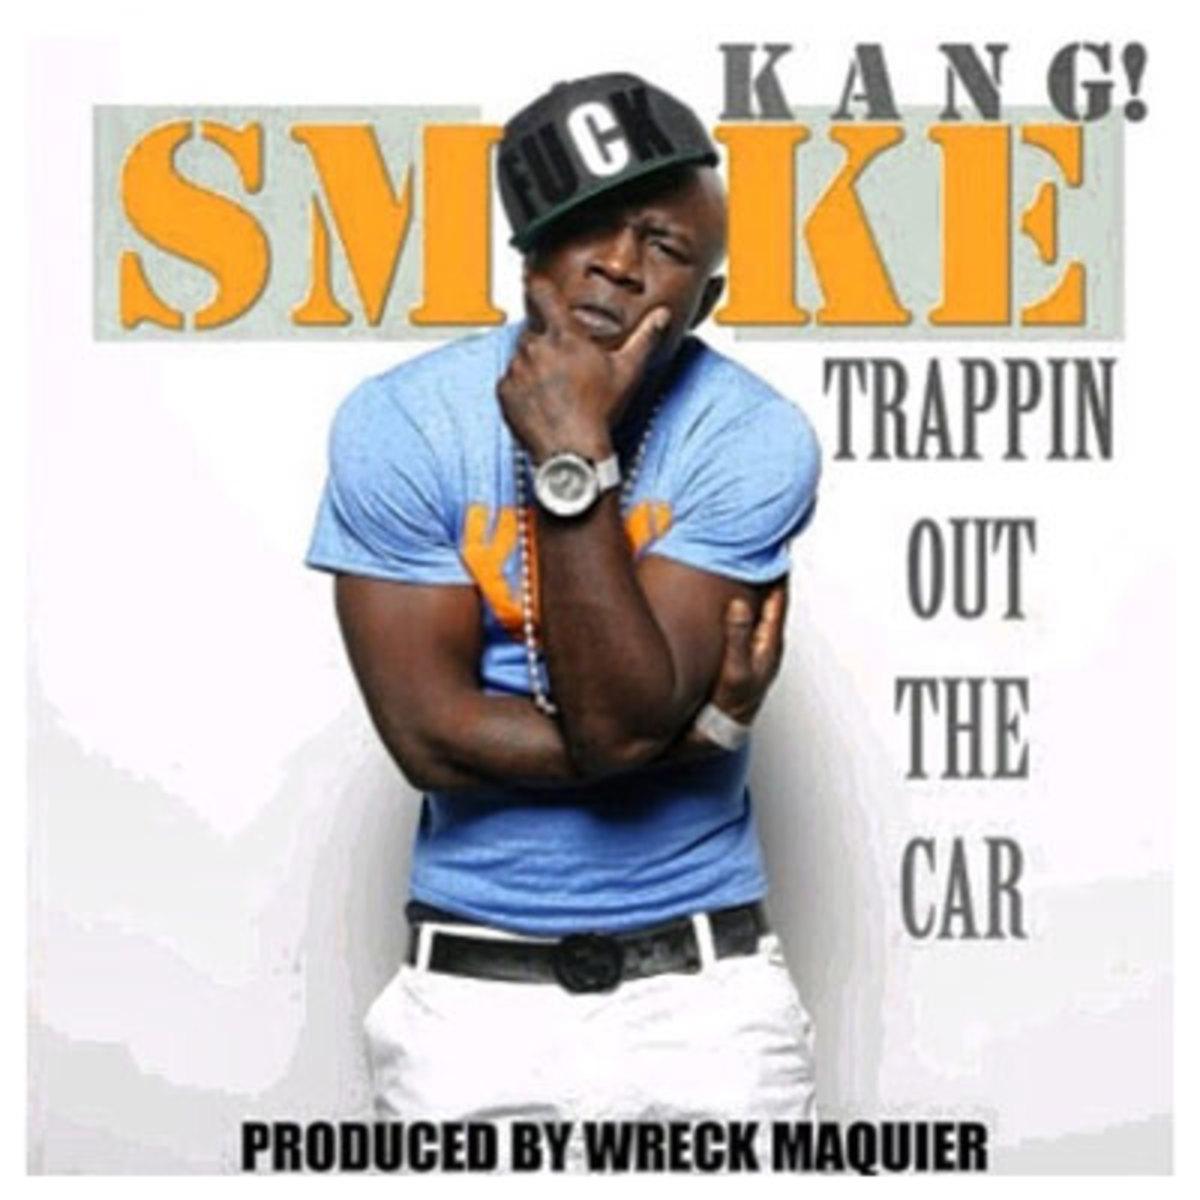 smokekang-trappin.jpg